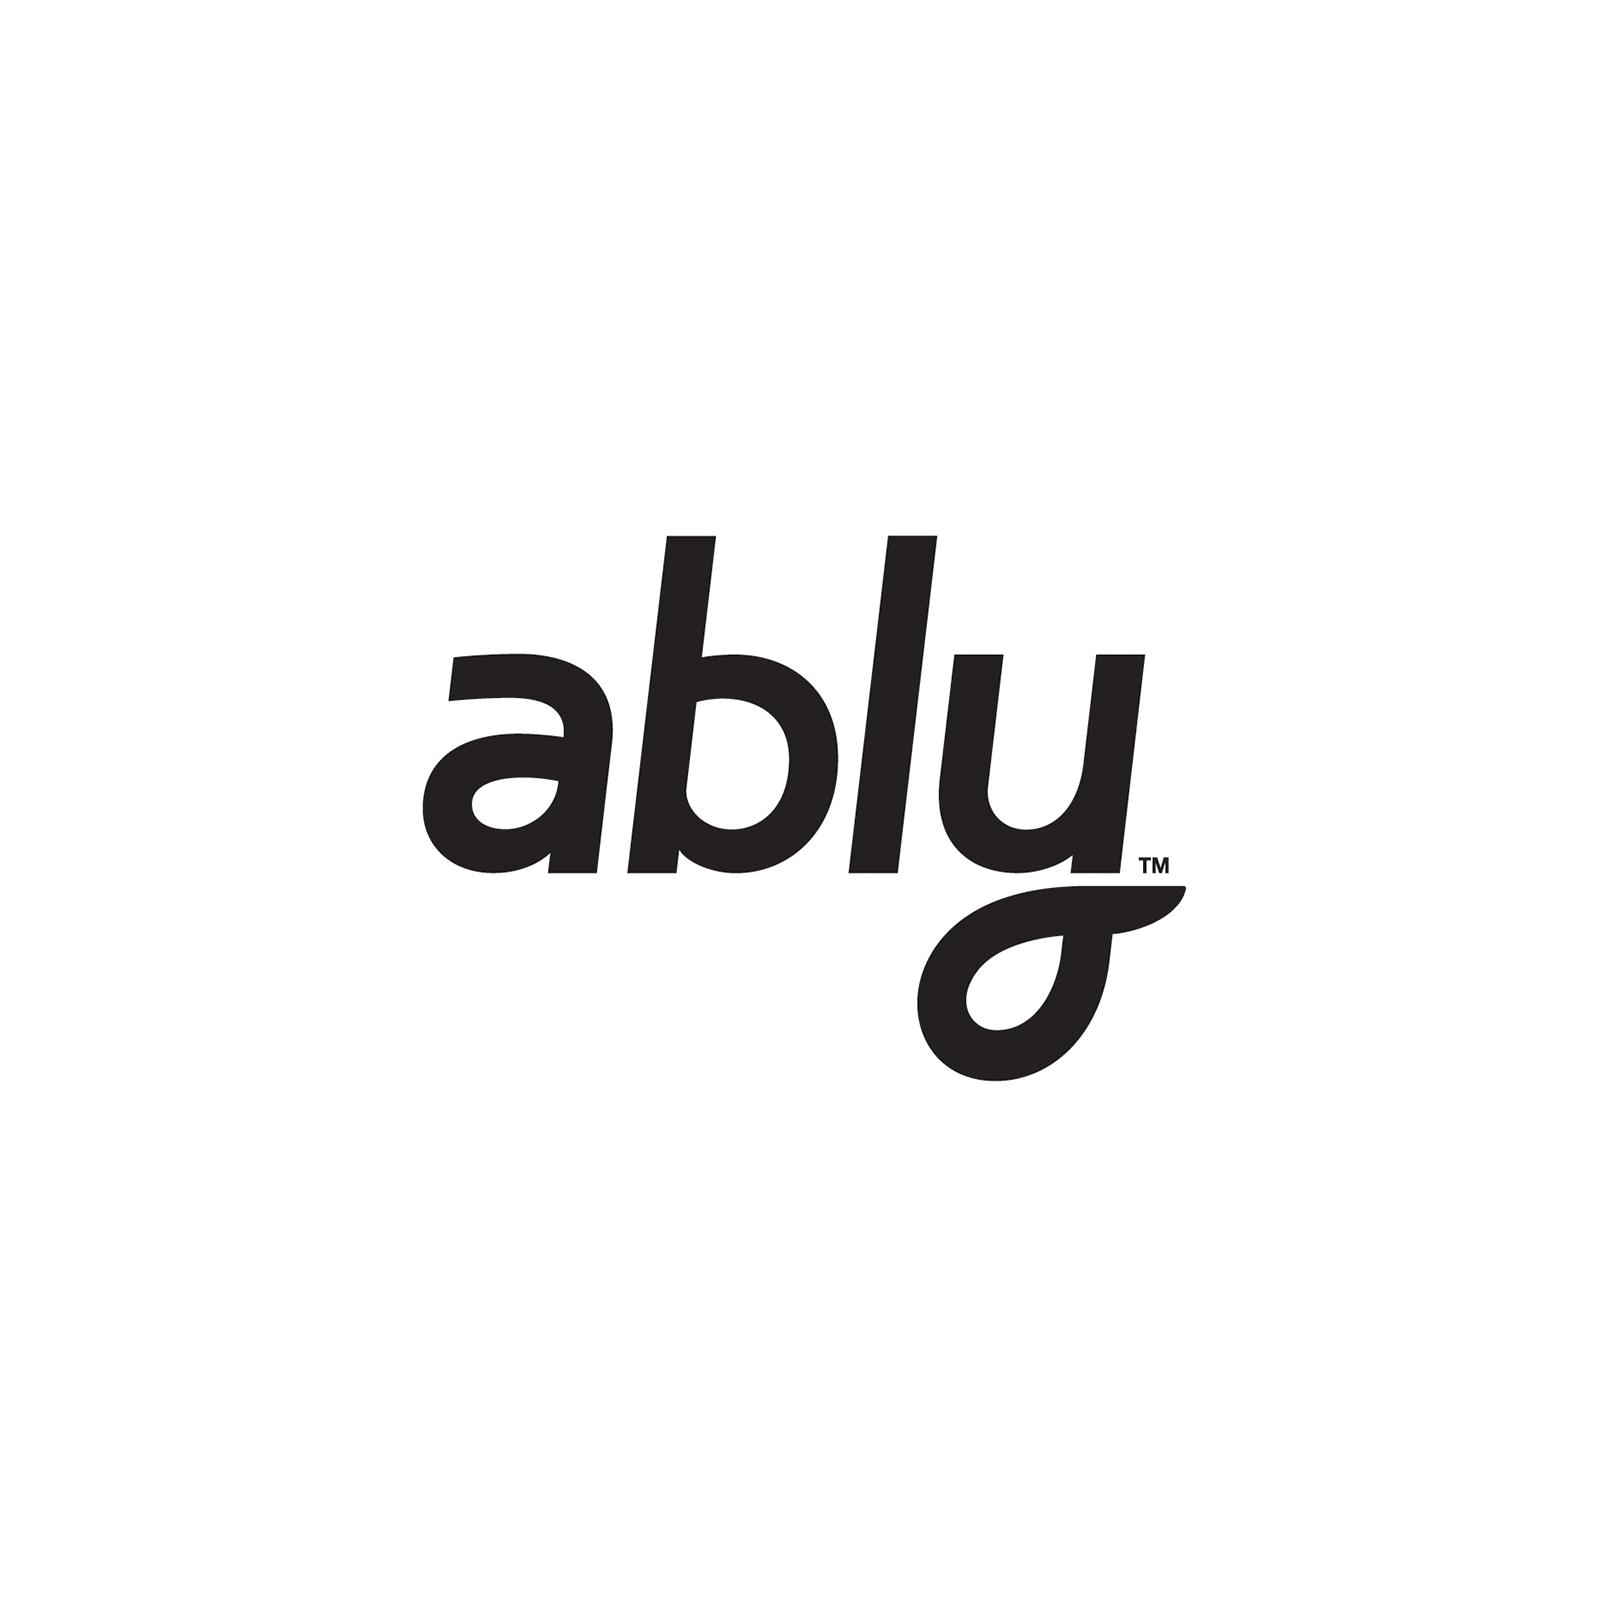 ably logo 2.jpg